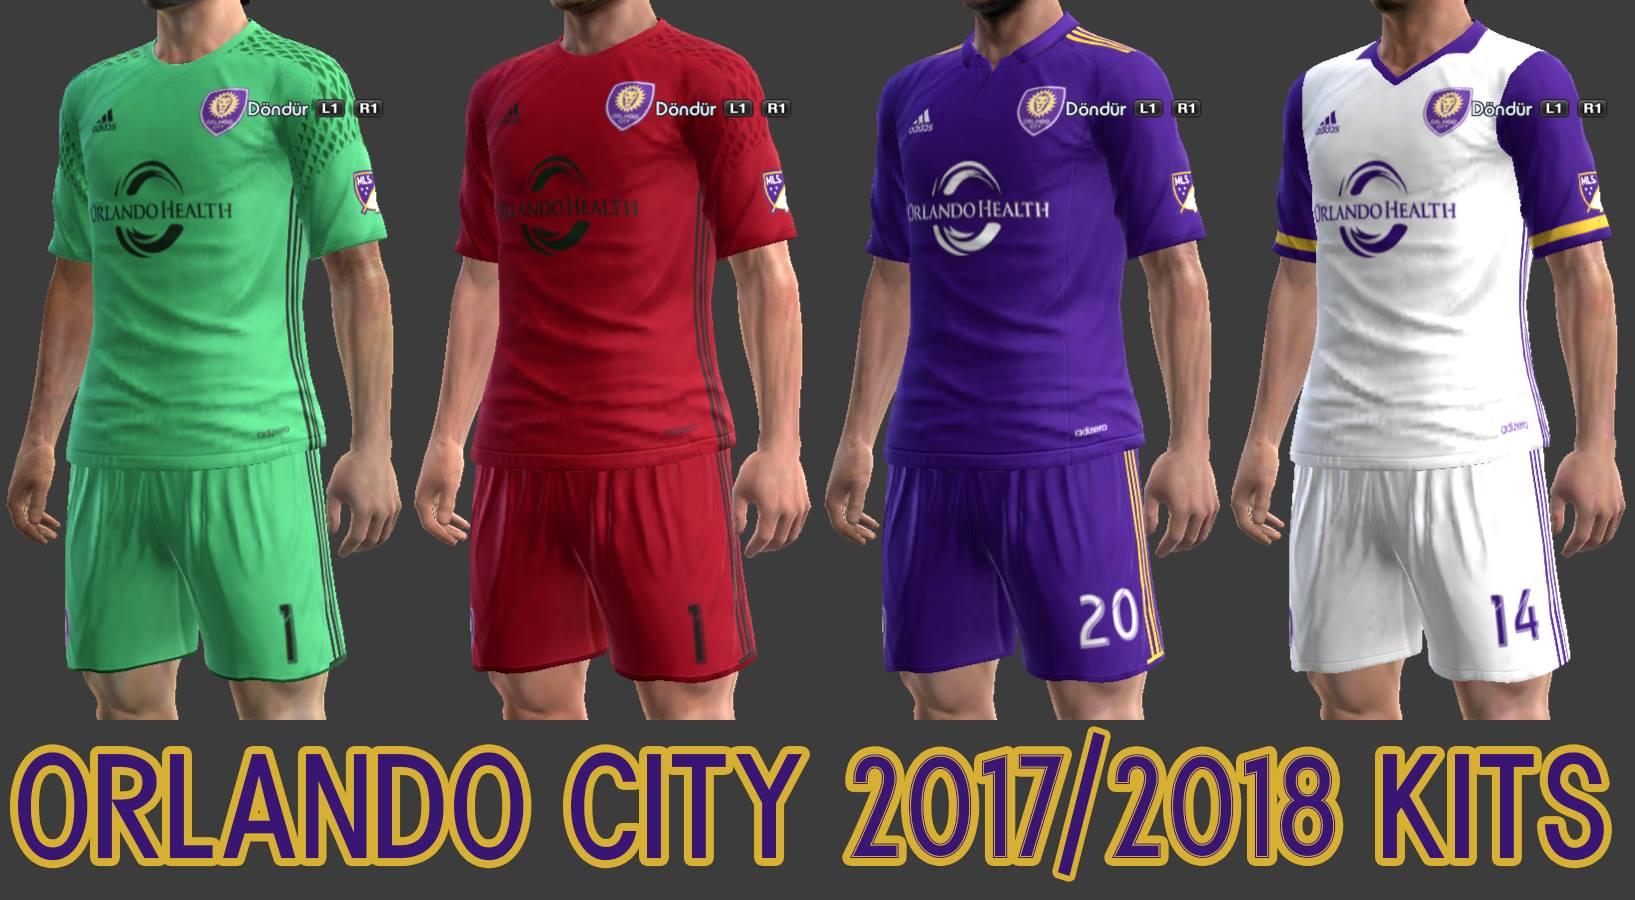 PES2013 Orlando City 17 18 GDB Kits by AbdDlsz - کیت پک فصل 2017/18 تیم Orlando City SC از لیگ (MLS) برای Pes 2013